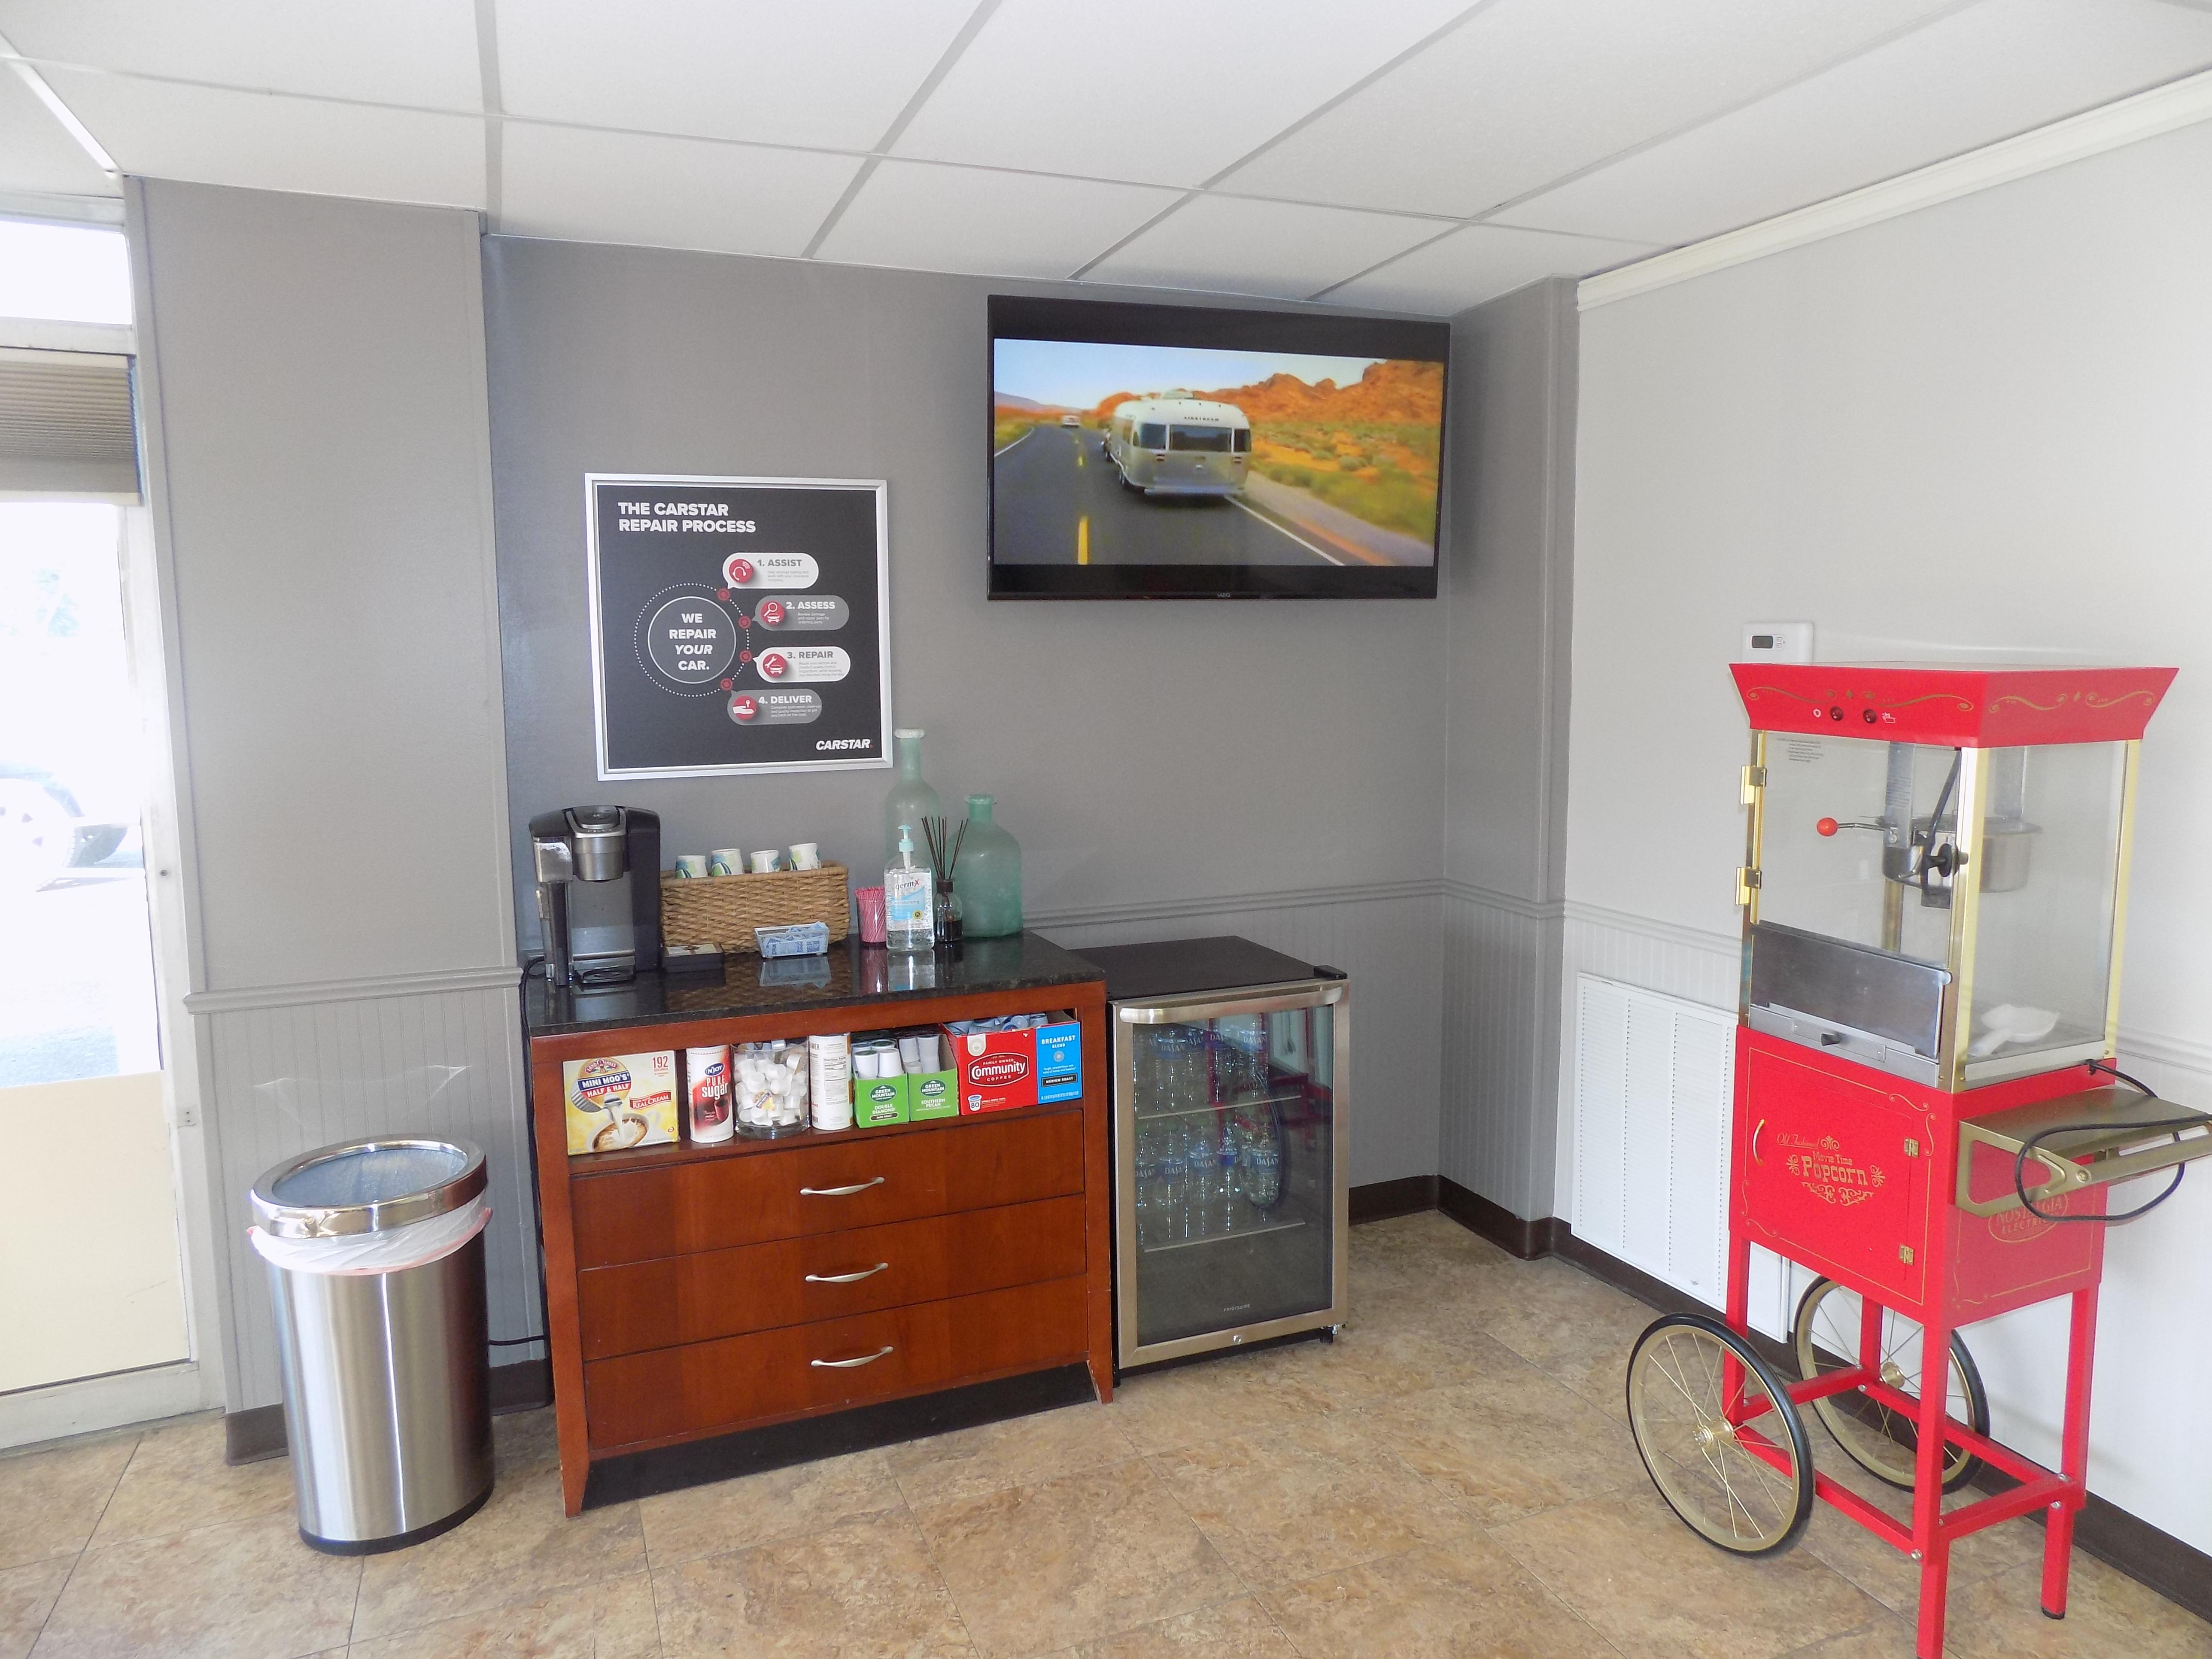 Carstar | Customer Refreshment Station